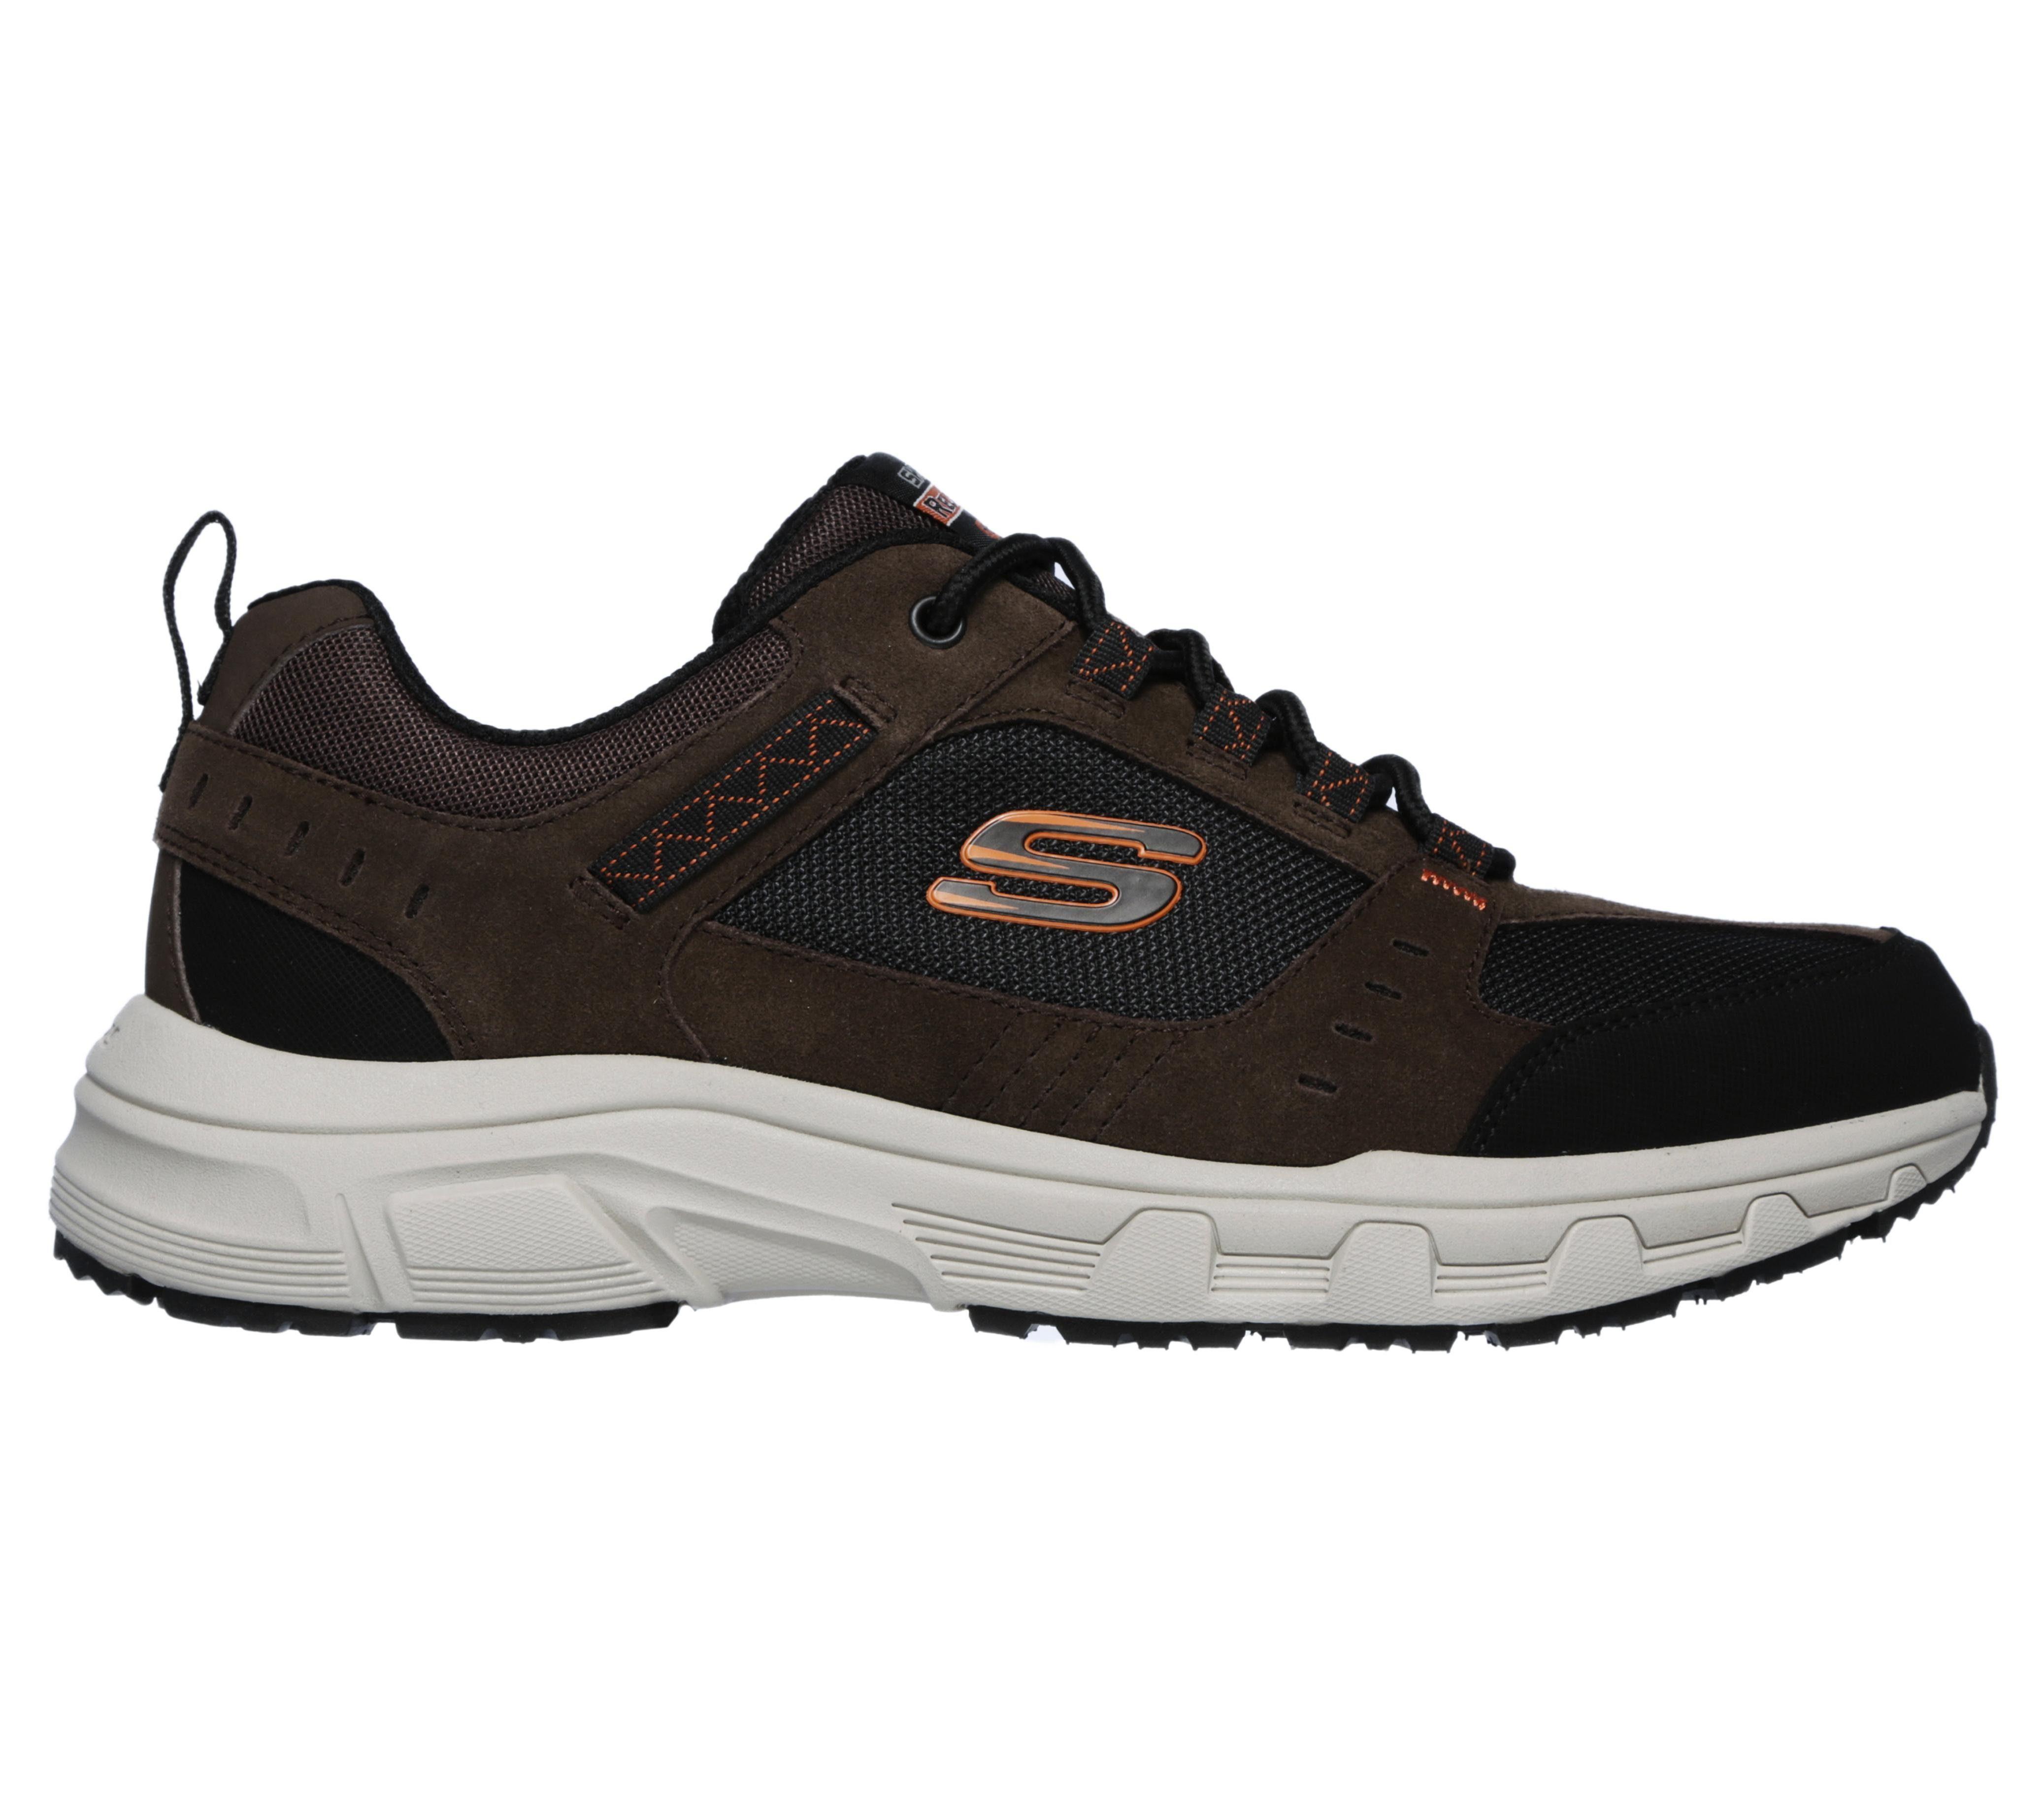 Skechers »Oak Canyon« Sneaker mit bequemer Memory Foam Ausstattung online kaufen   OTTO